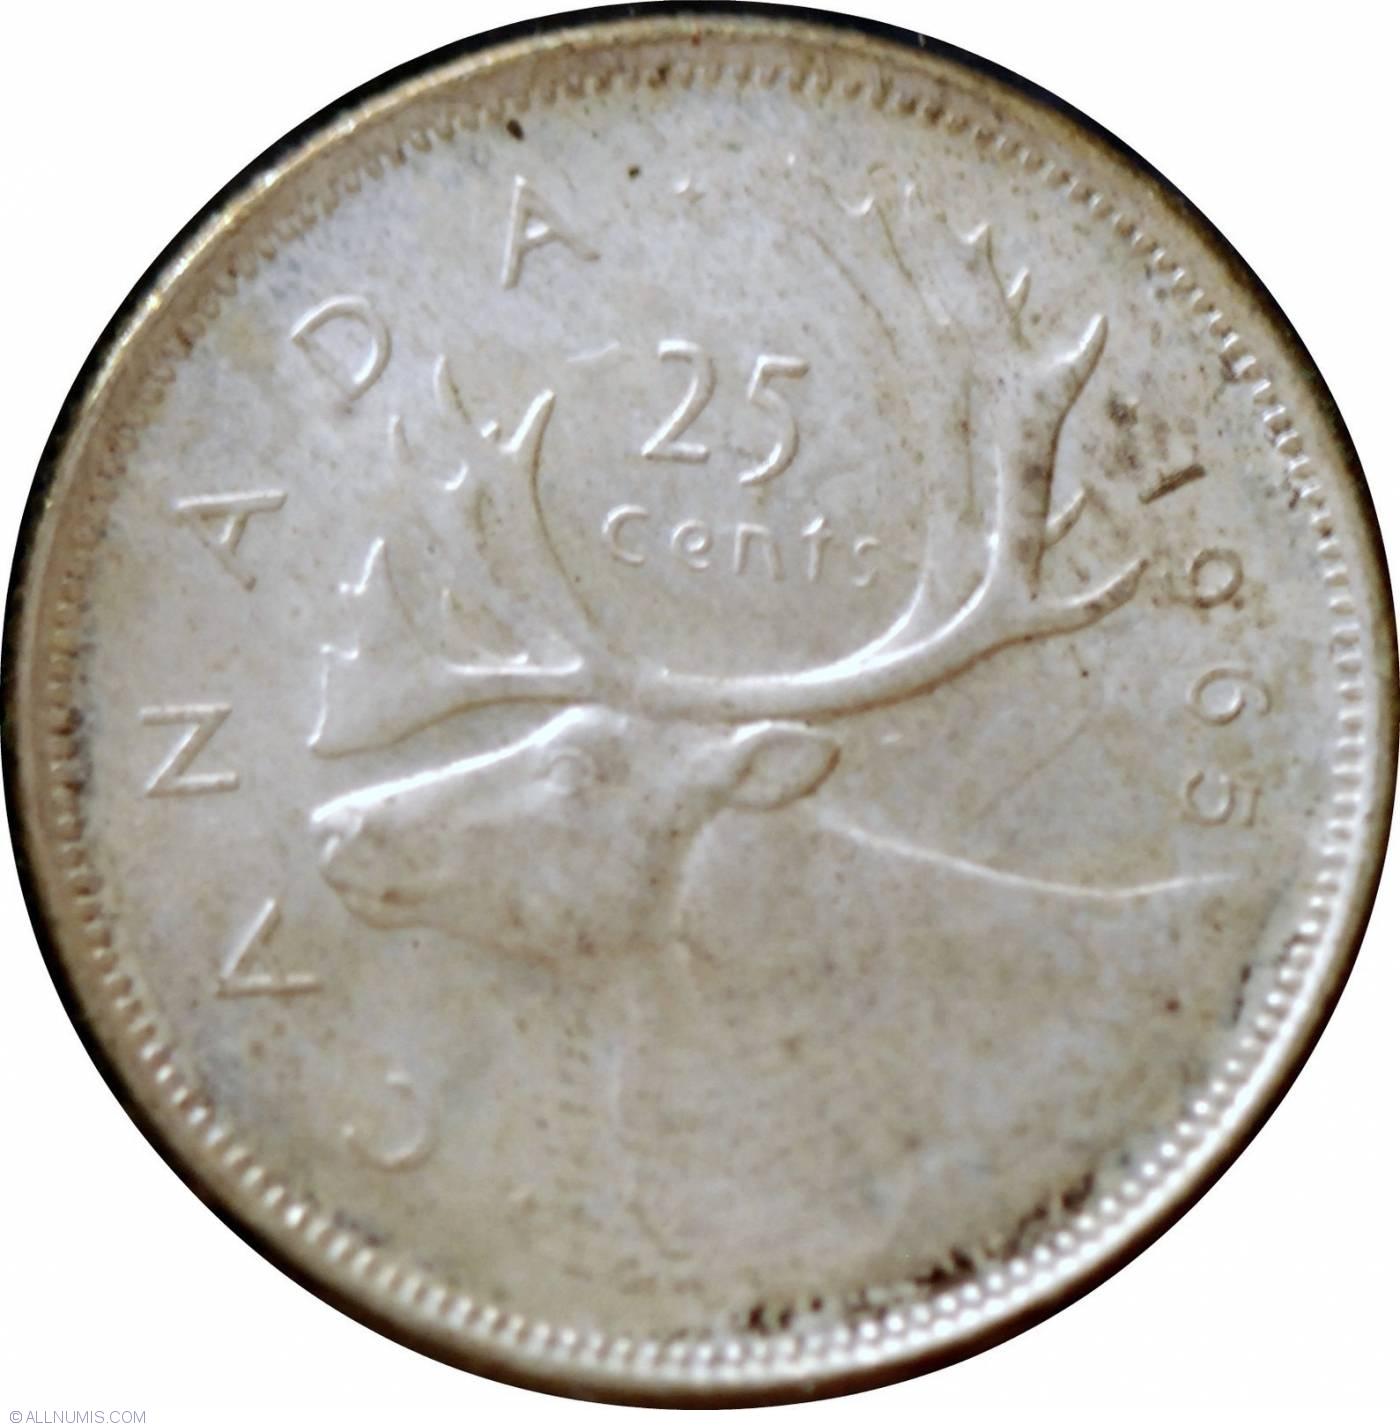 25 Cents 1965 Elizabeth Ii 1953 Present Canada Coin 24553